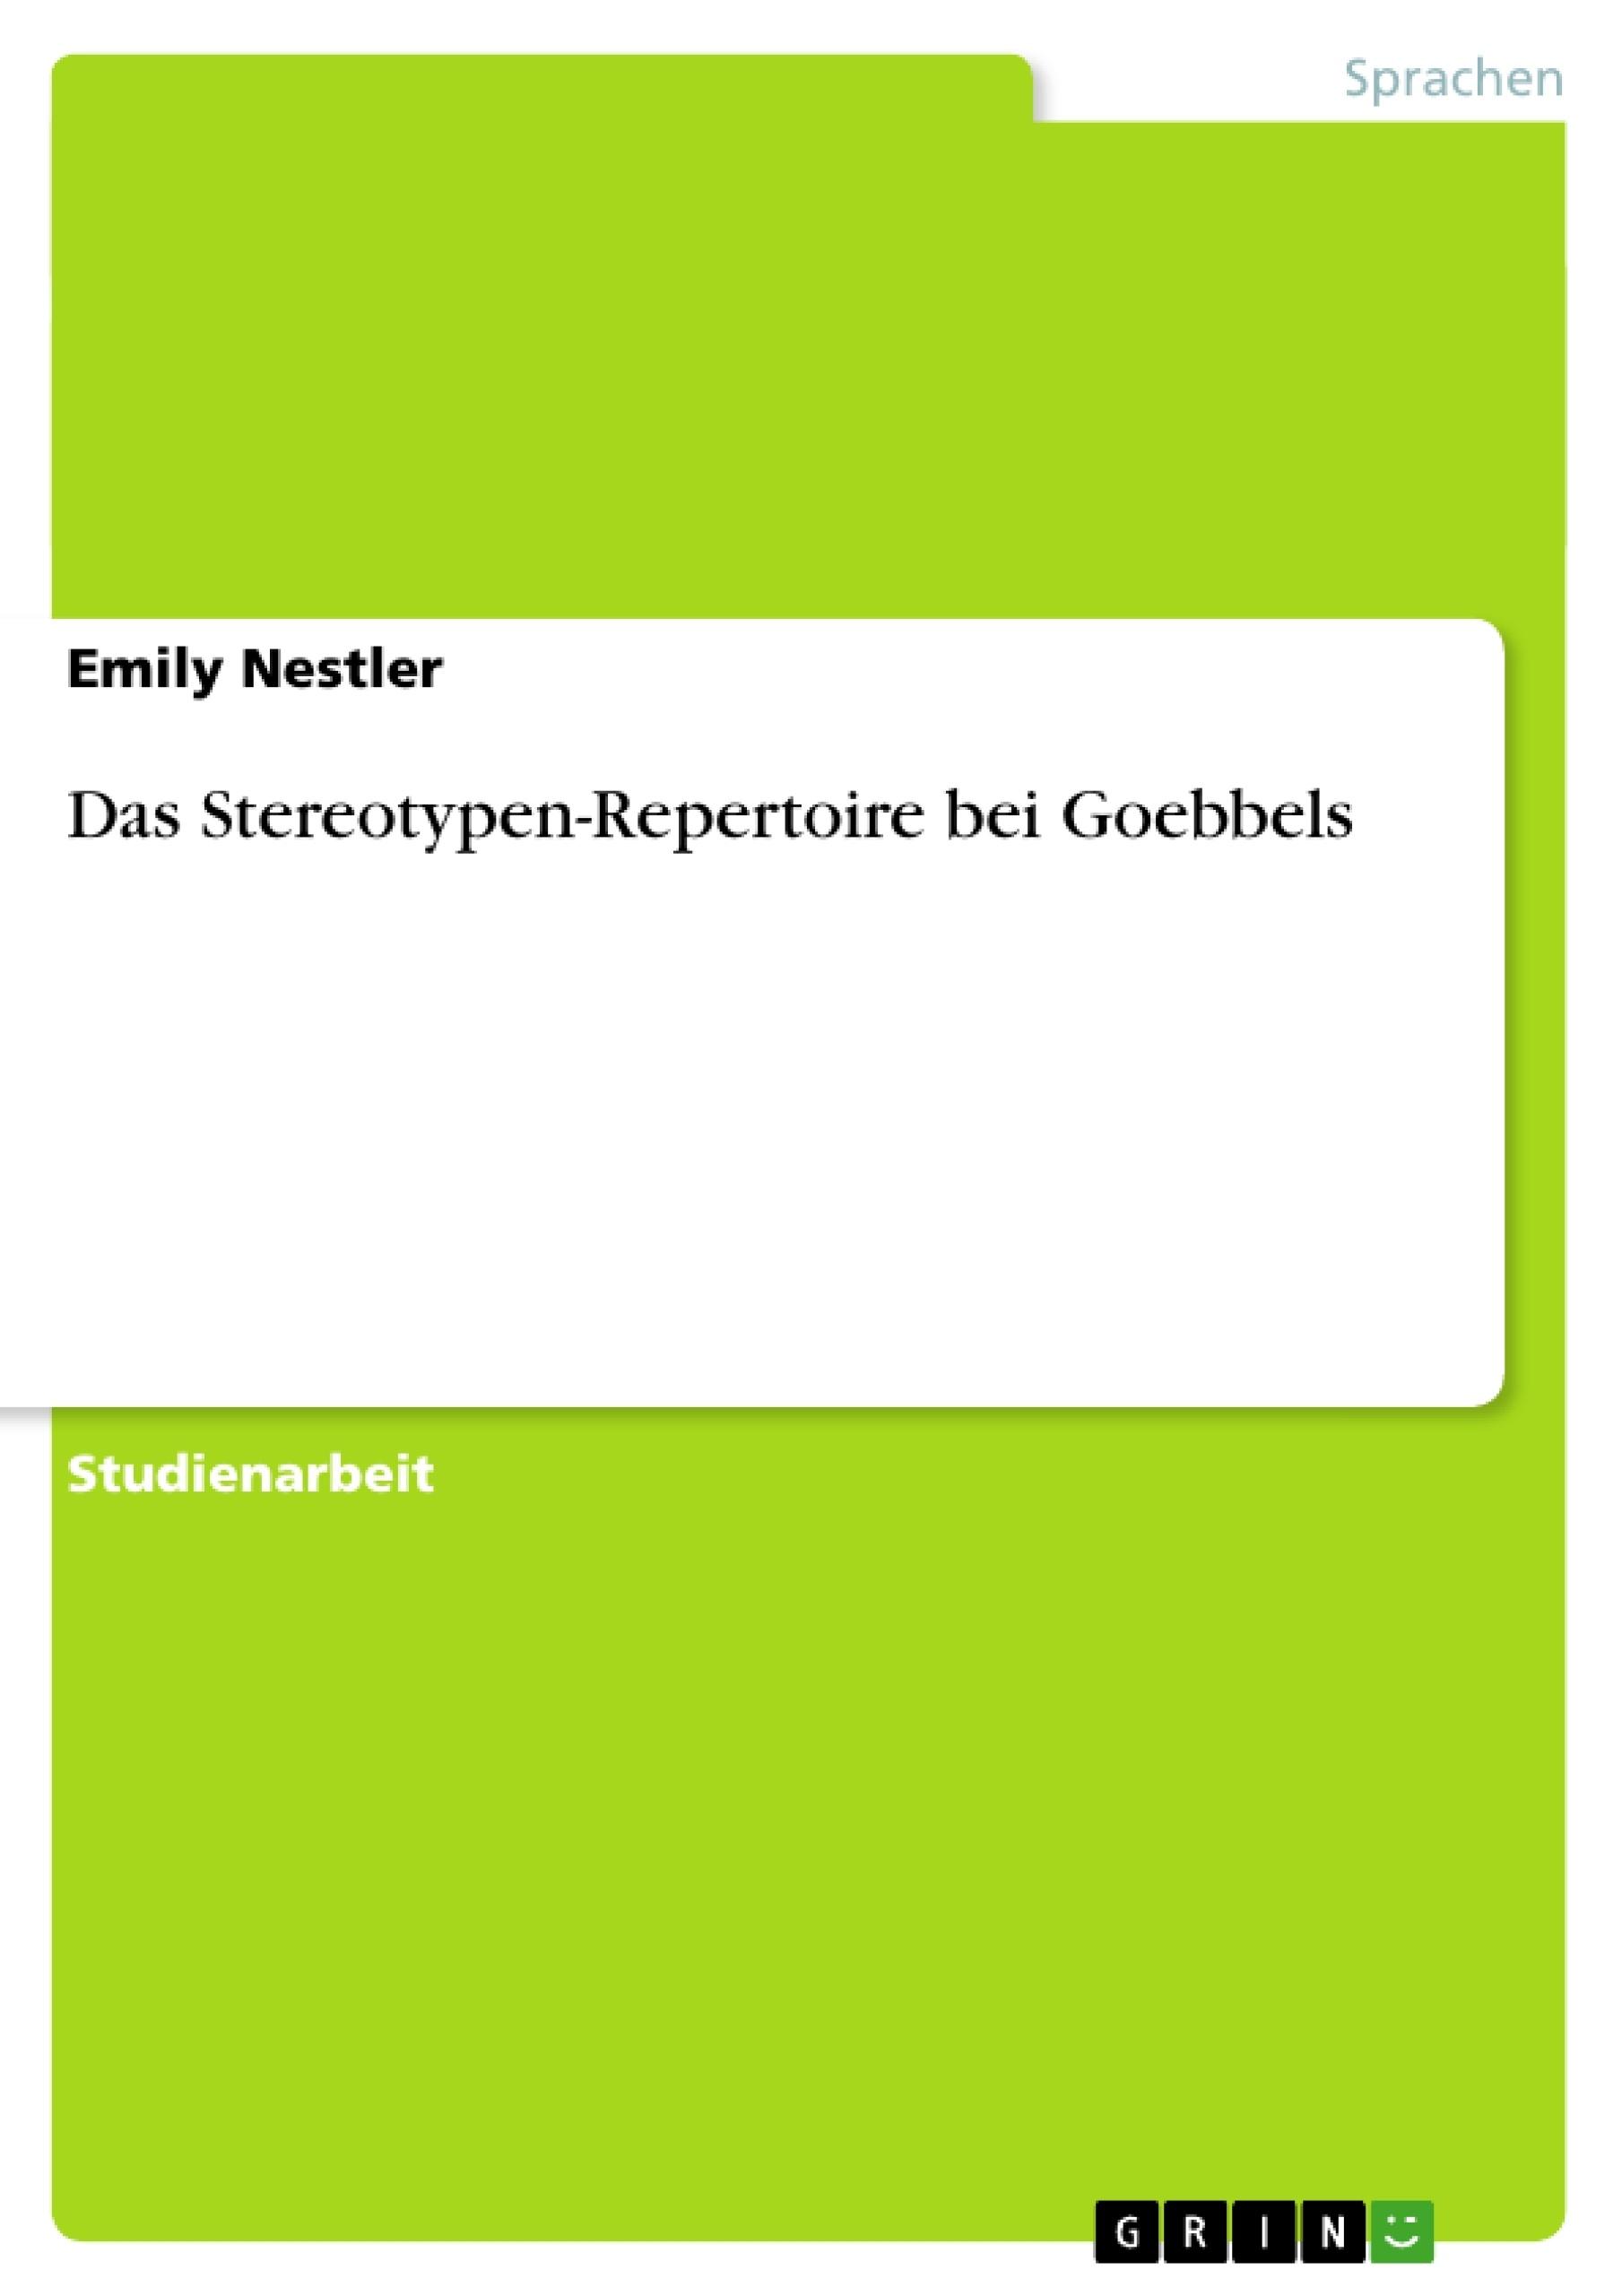 Titel: Das Stereotypen-Repertoire bei Goebbels